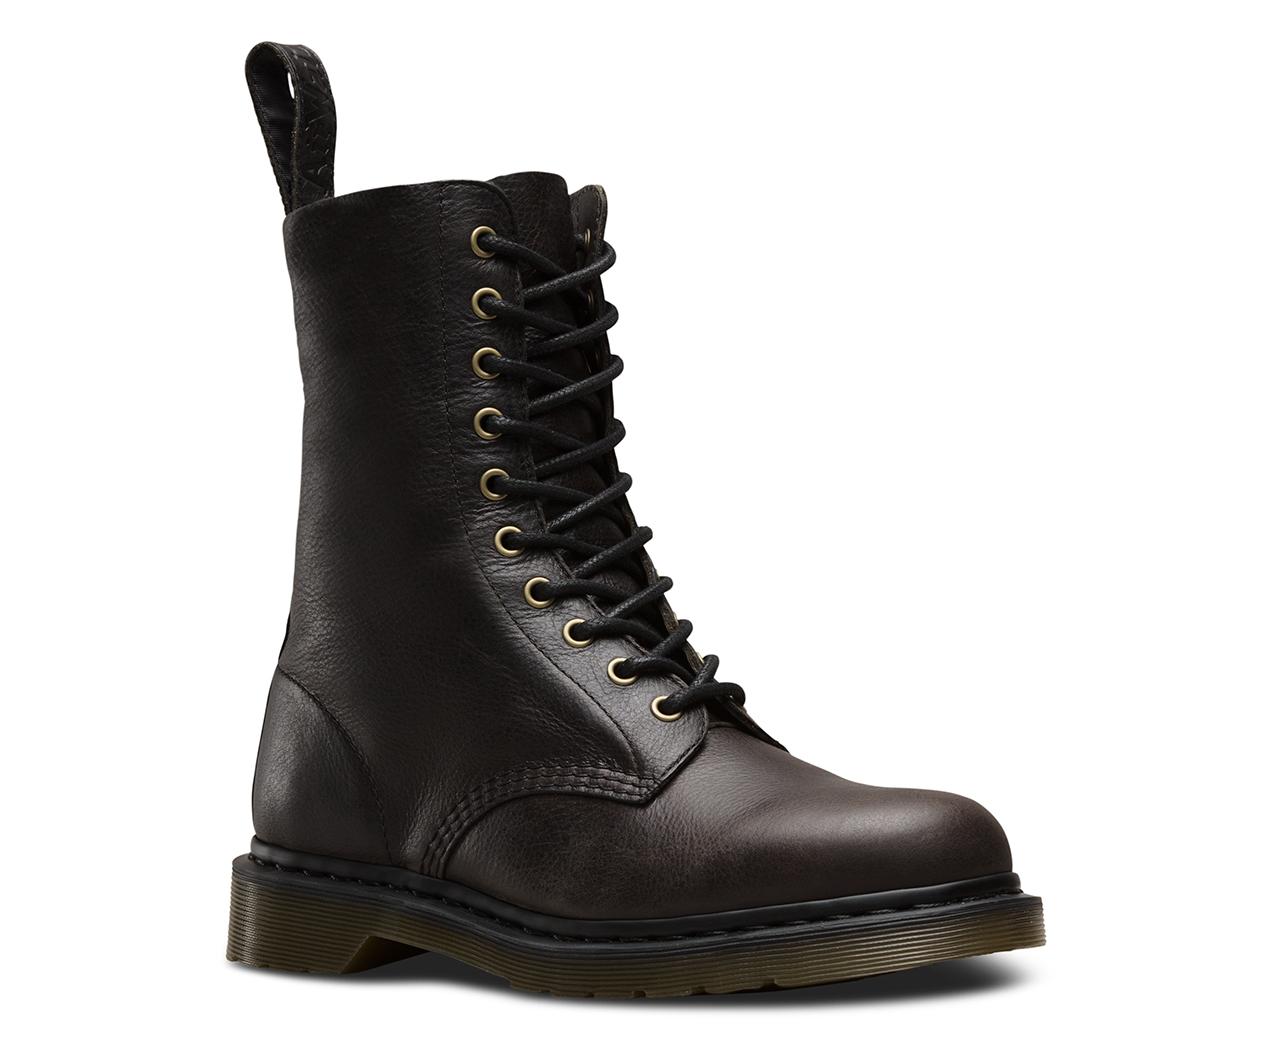 Dr martens dr martens core 8065 mary jane black leather women's shoes bootsdr martens pwsale retailer